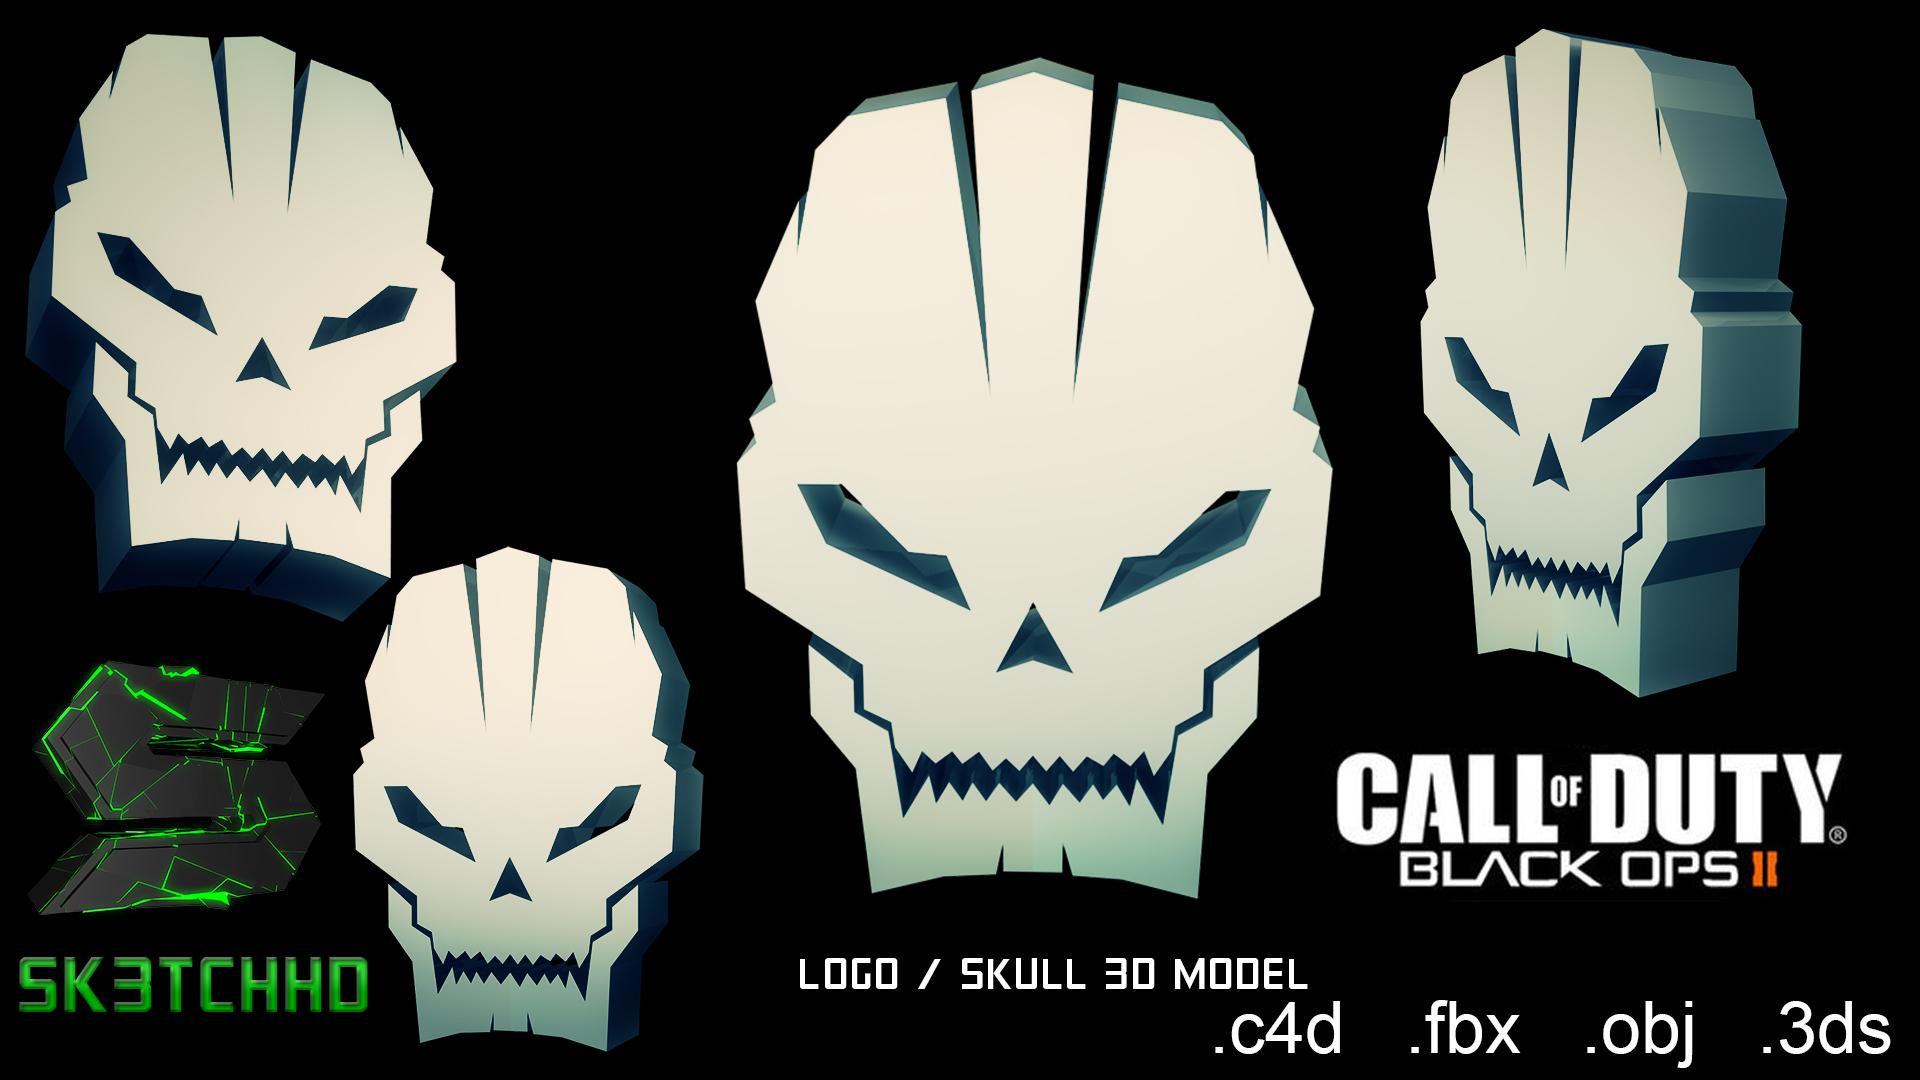 Call Of Duty Black Ops 2 Skull 3d Model By Sk3tchhd On Deviantart